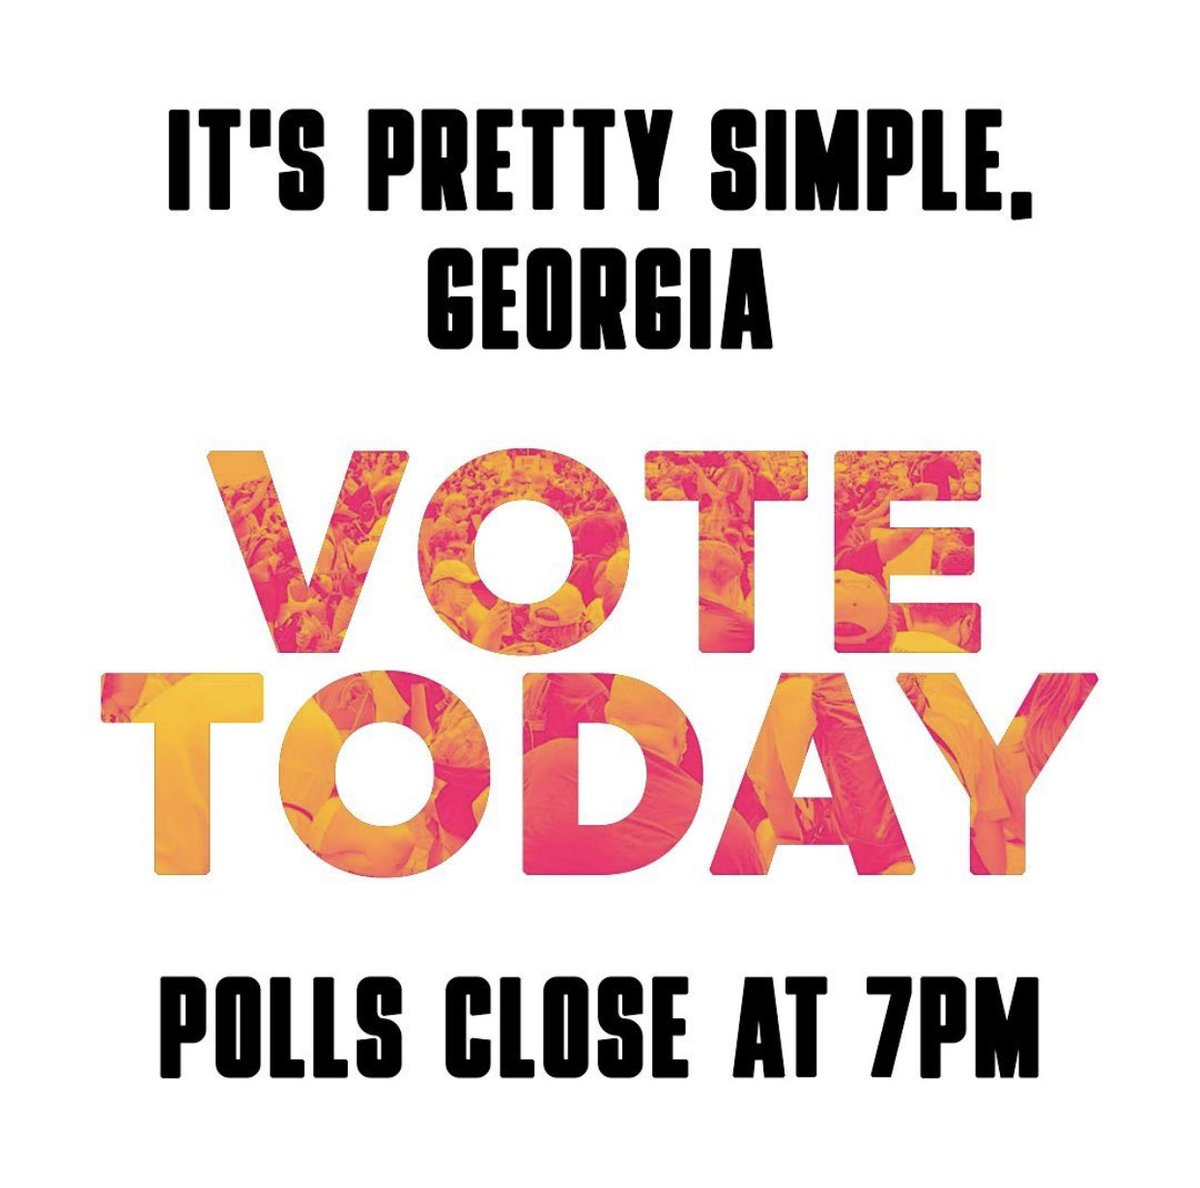 #vote https://t.co/72LKC4iMQZ